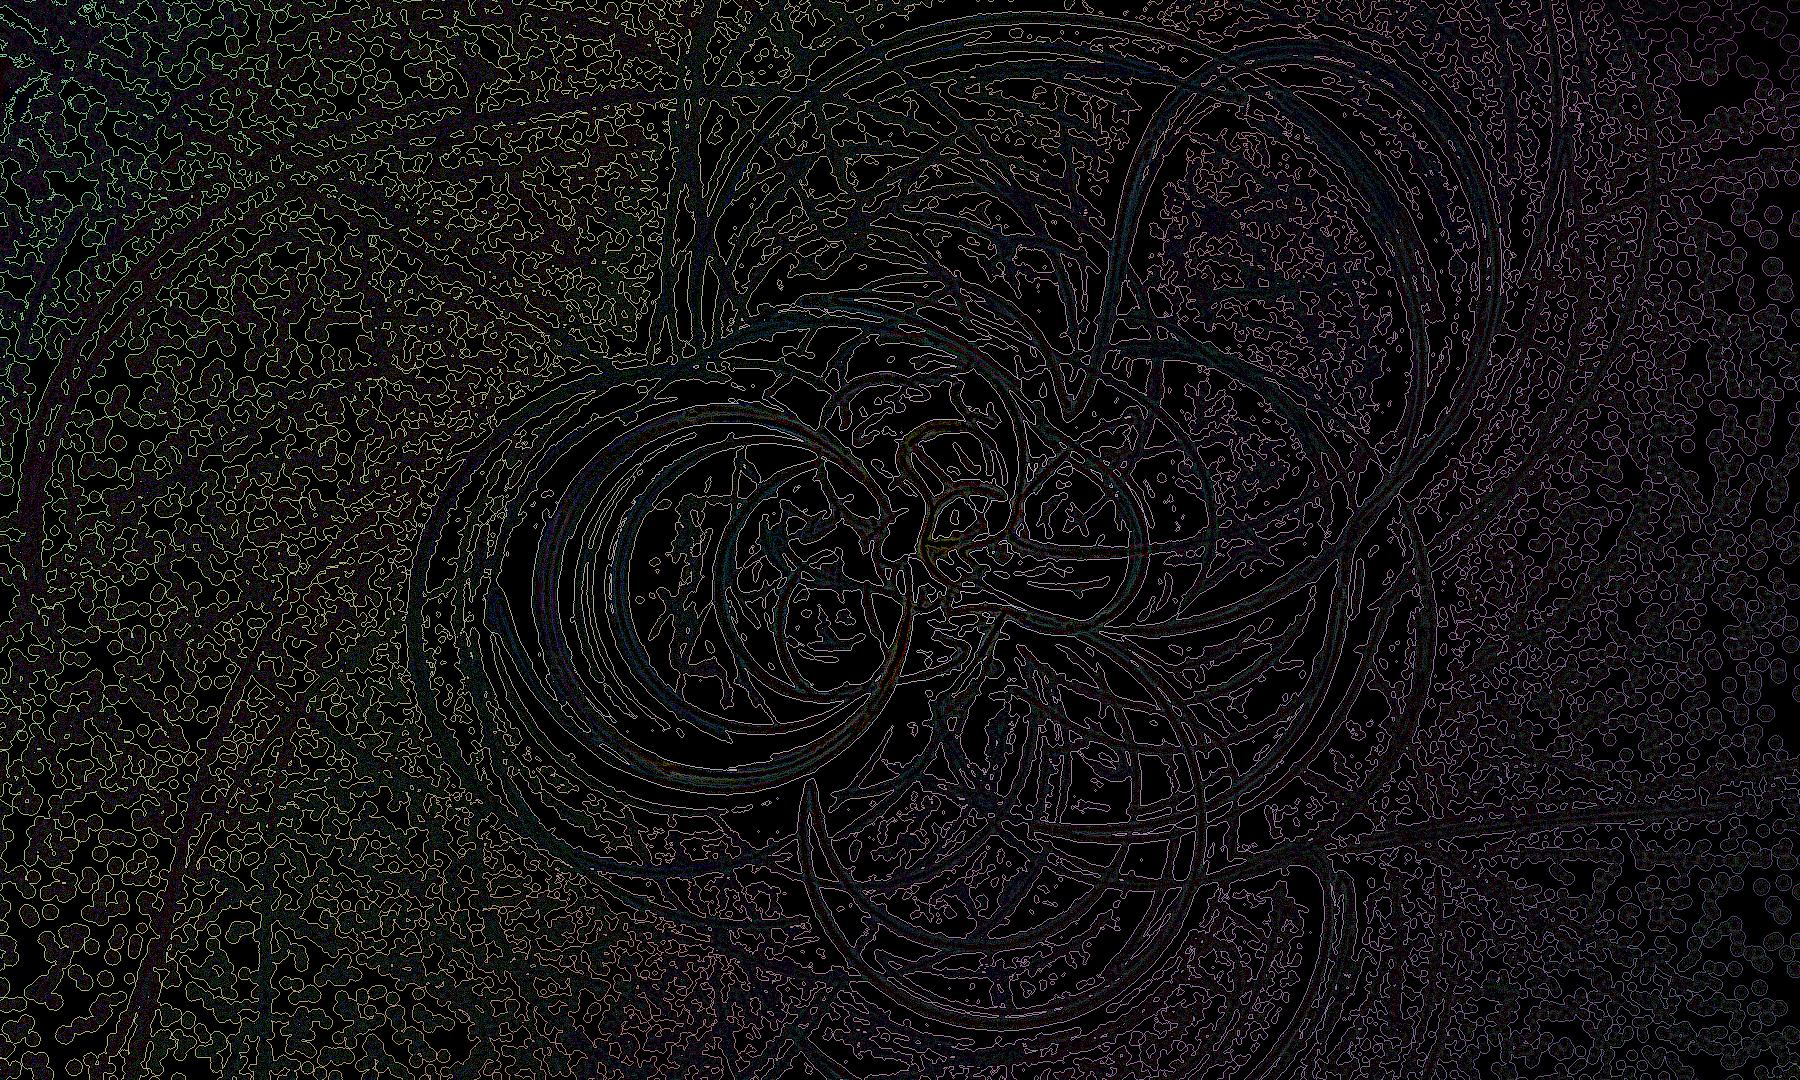 Image ID: 187838